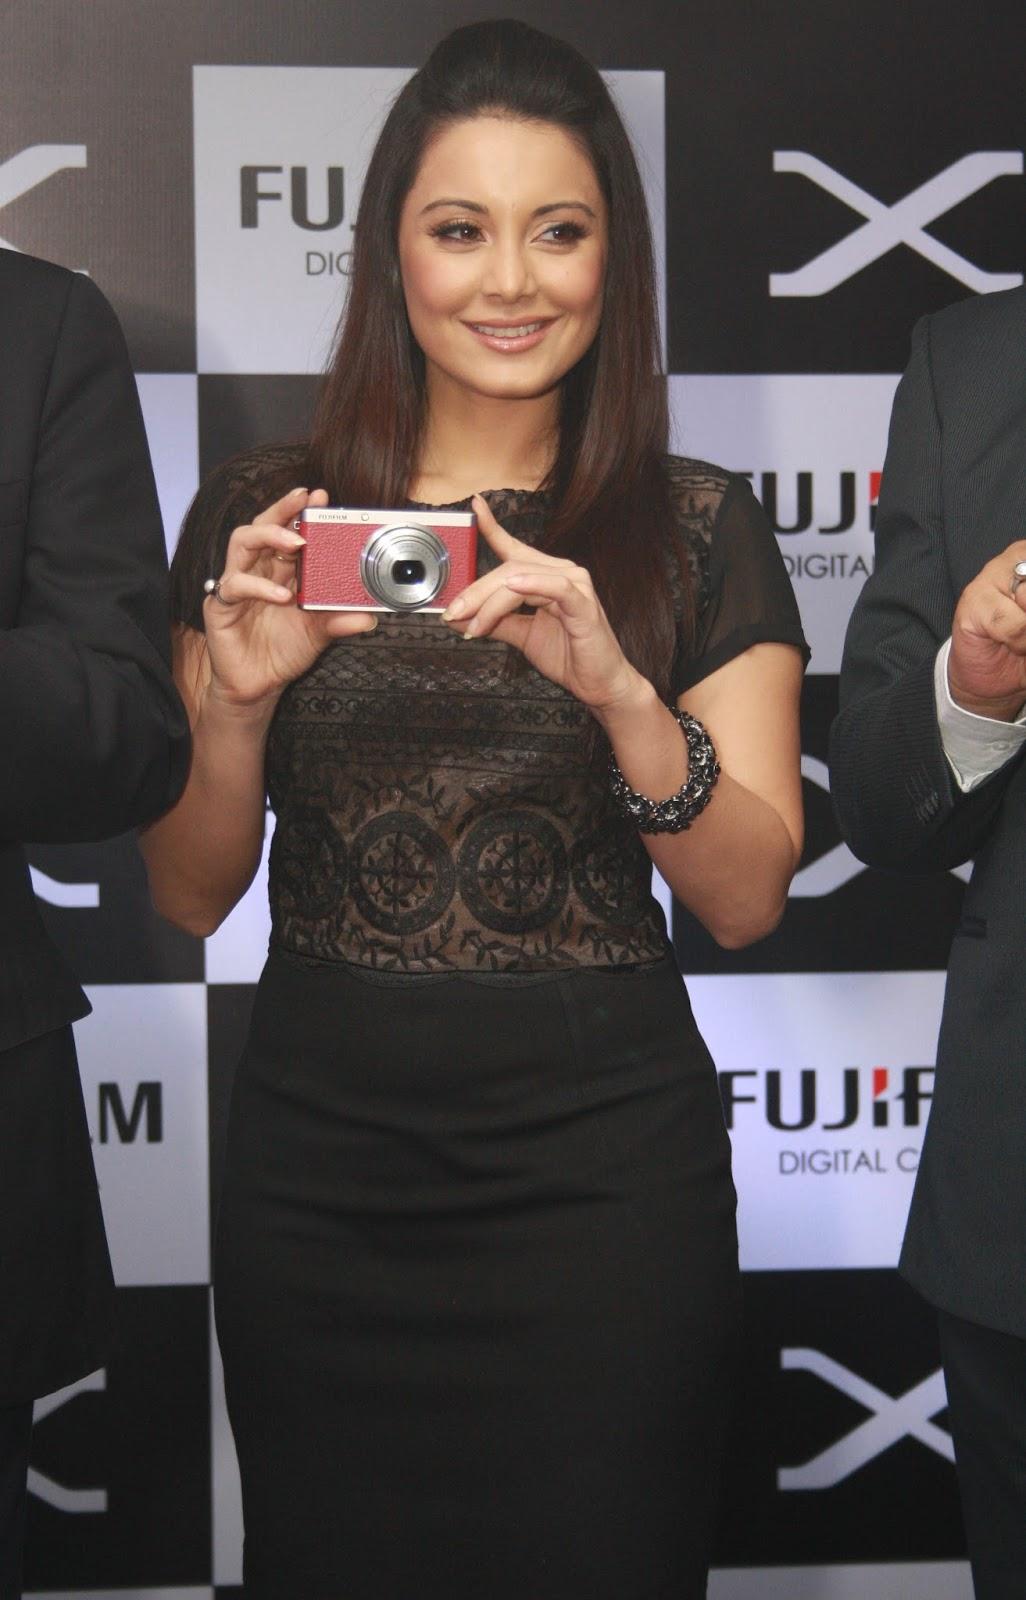 Minissha Lamba Looks Super At Fujifilms XF-1 Camera